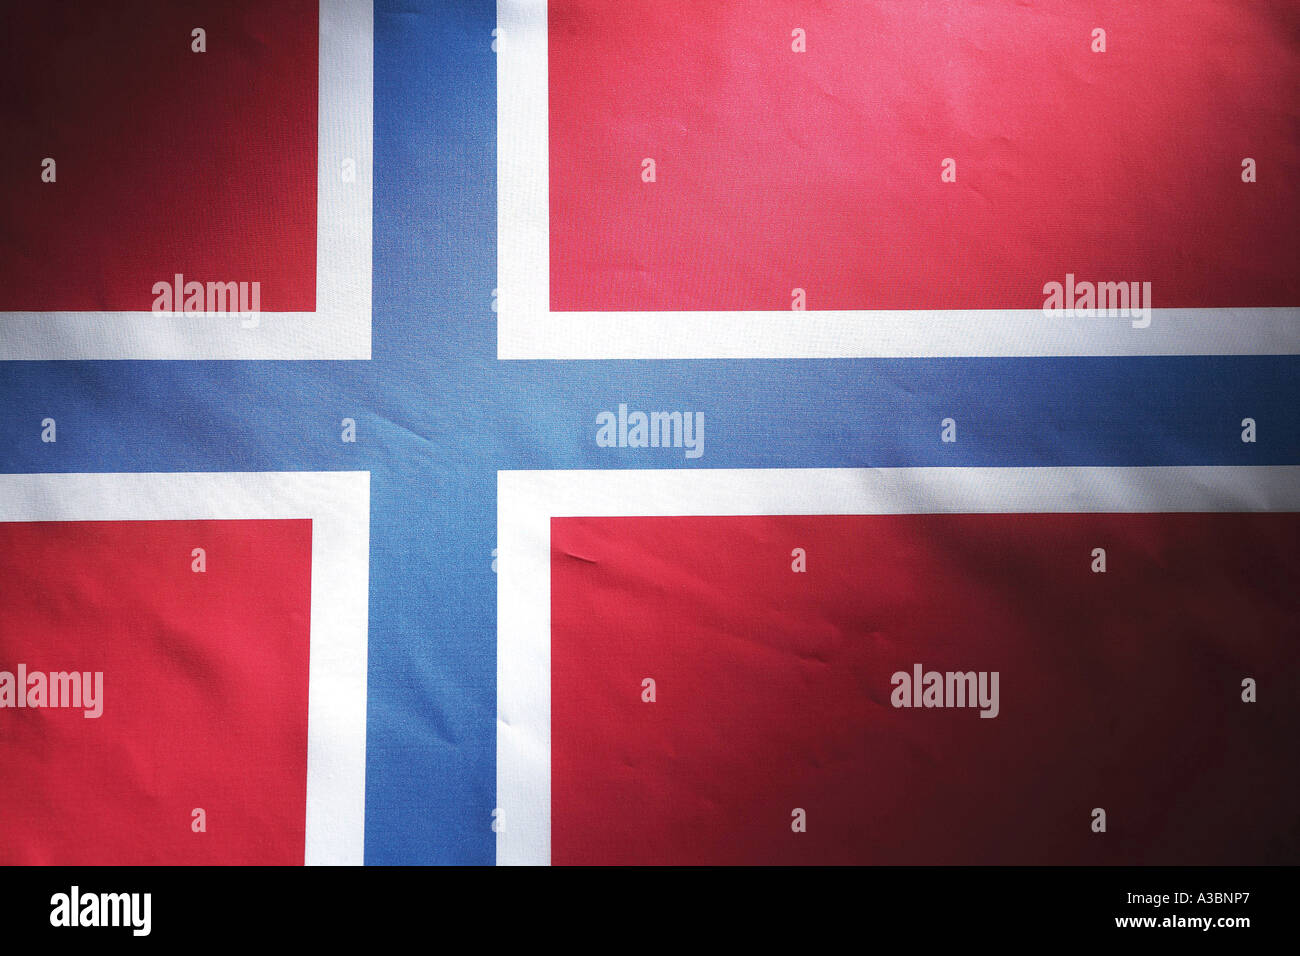 Norway national flag,national flag,Norway,Norwegia - Stock Image